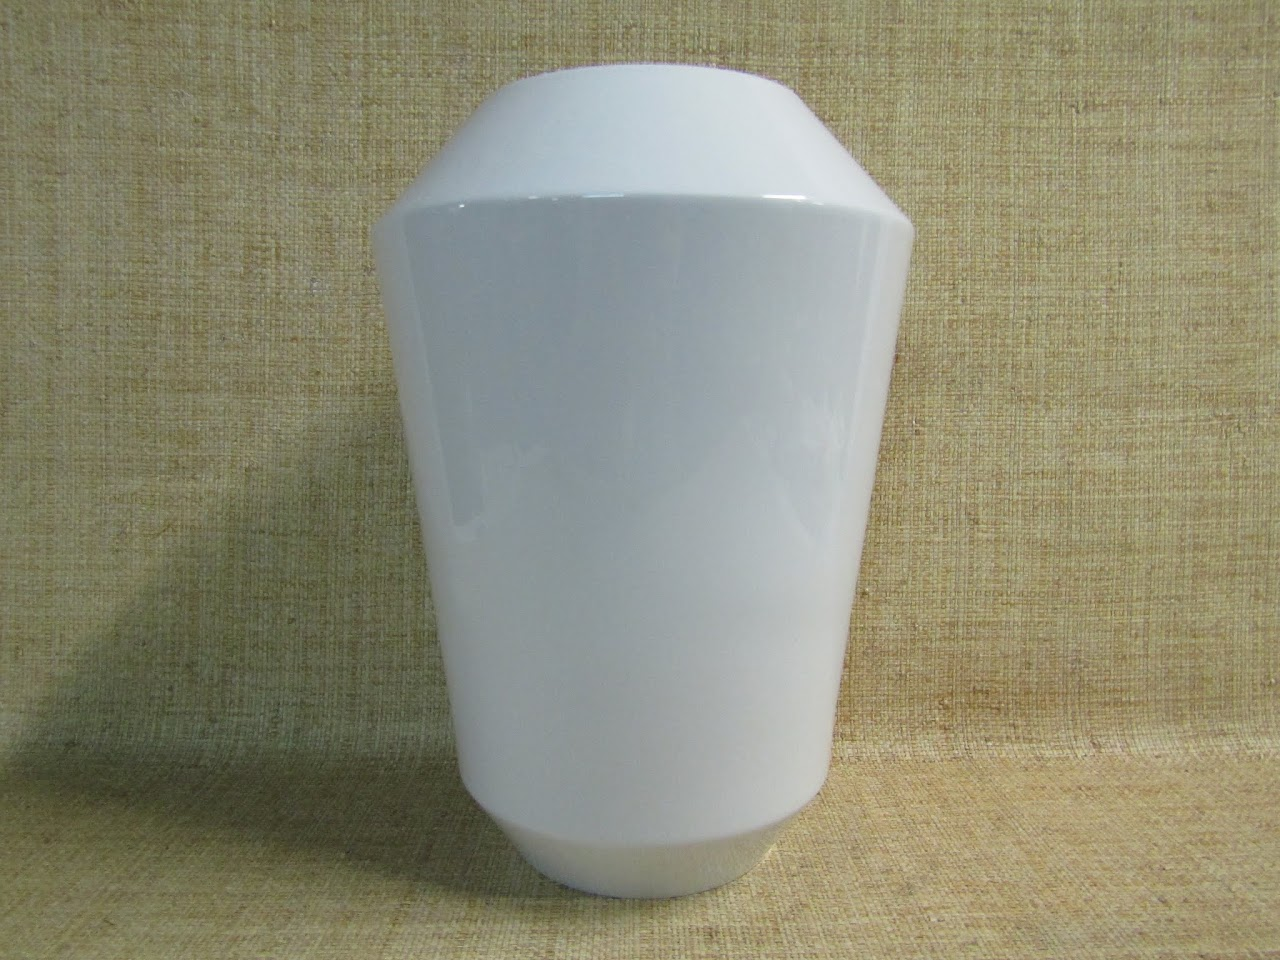 Sieger by Furstenberg Vase